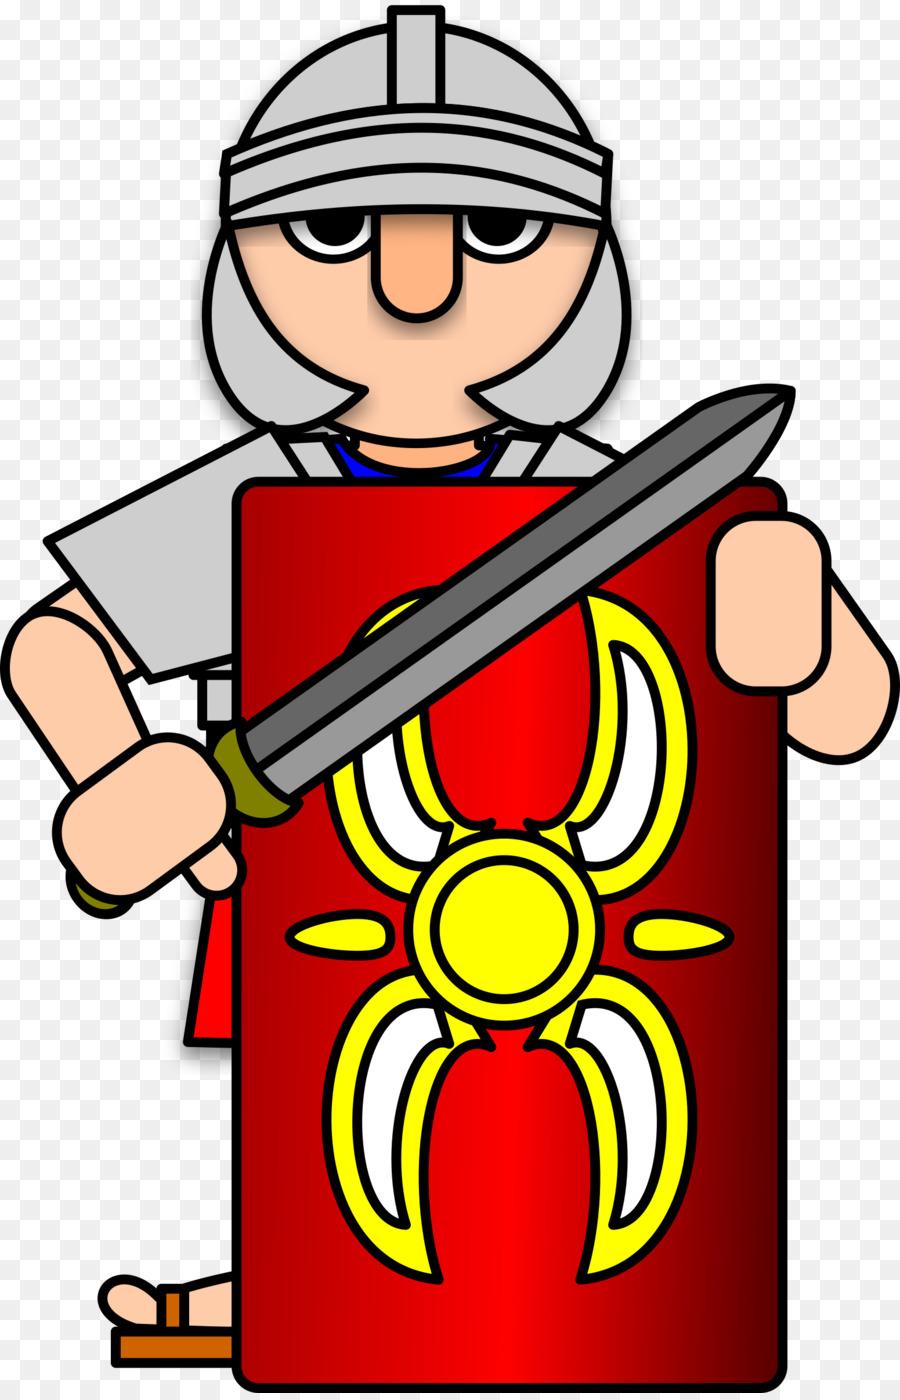 900x1400 Ancient Rome Roman Army Soldier Clip Art